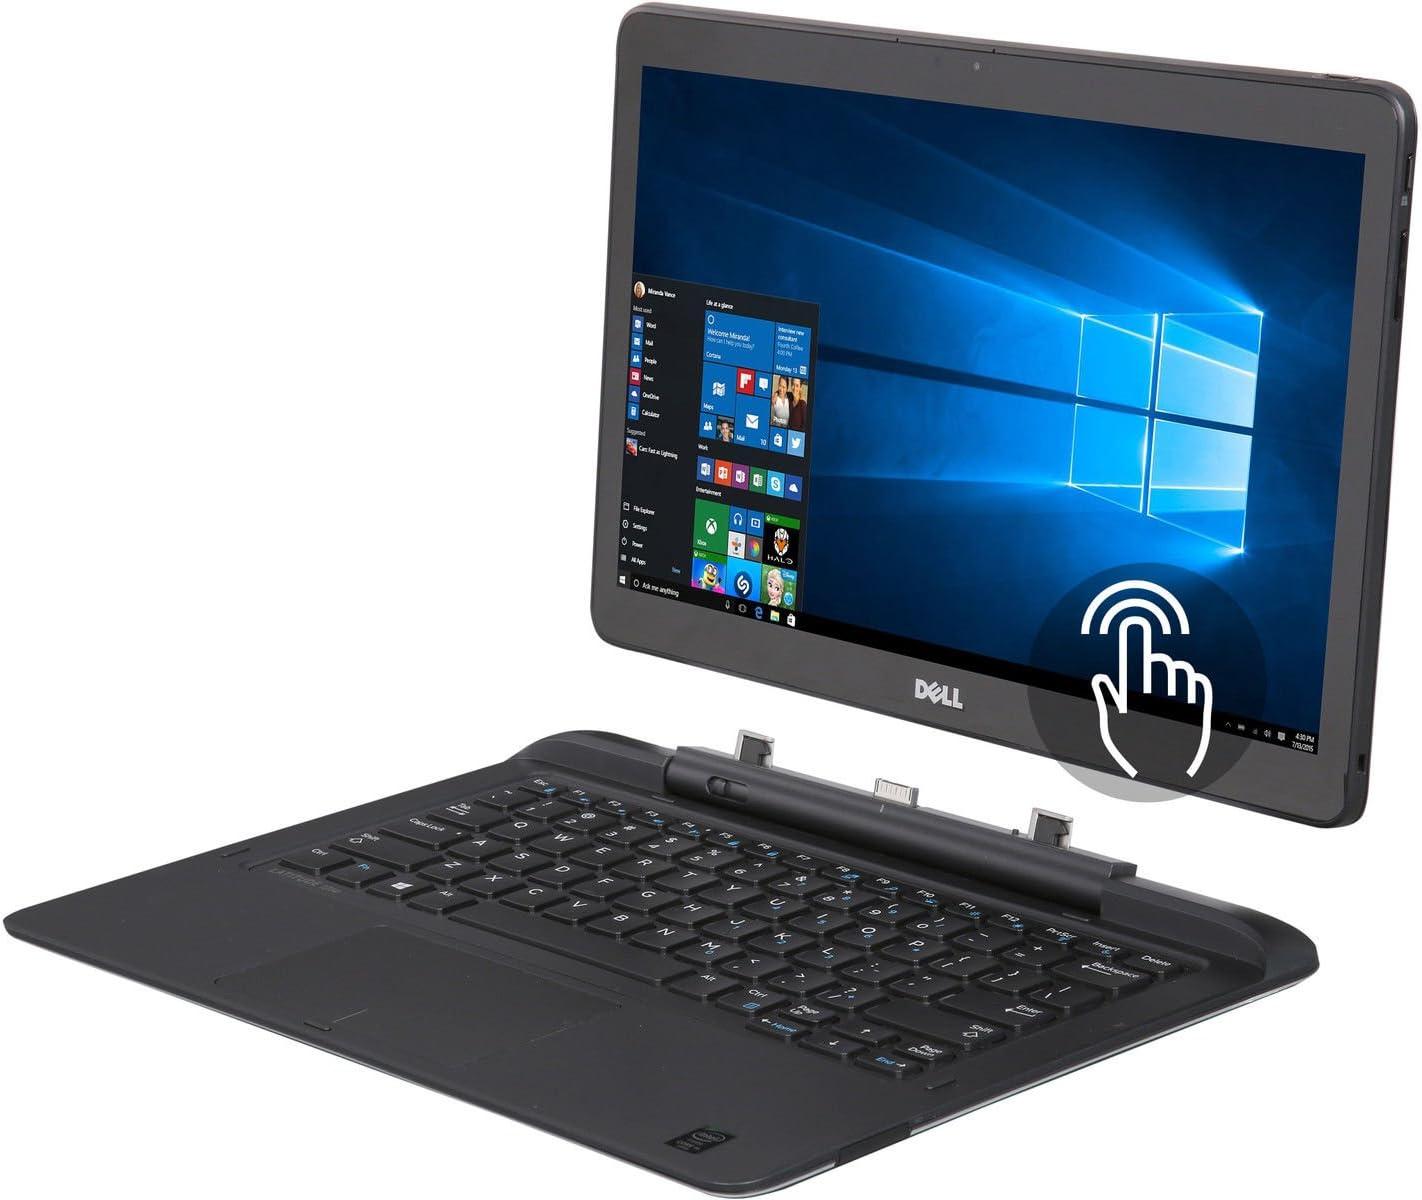 Dell Latitude E7350 Laptop NoteBook Intel Quad Core M5Y71 1.2 GHz 8GB Ram 256GB Solid State SSD Windows 10 Pro (Renewed)